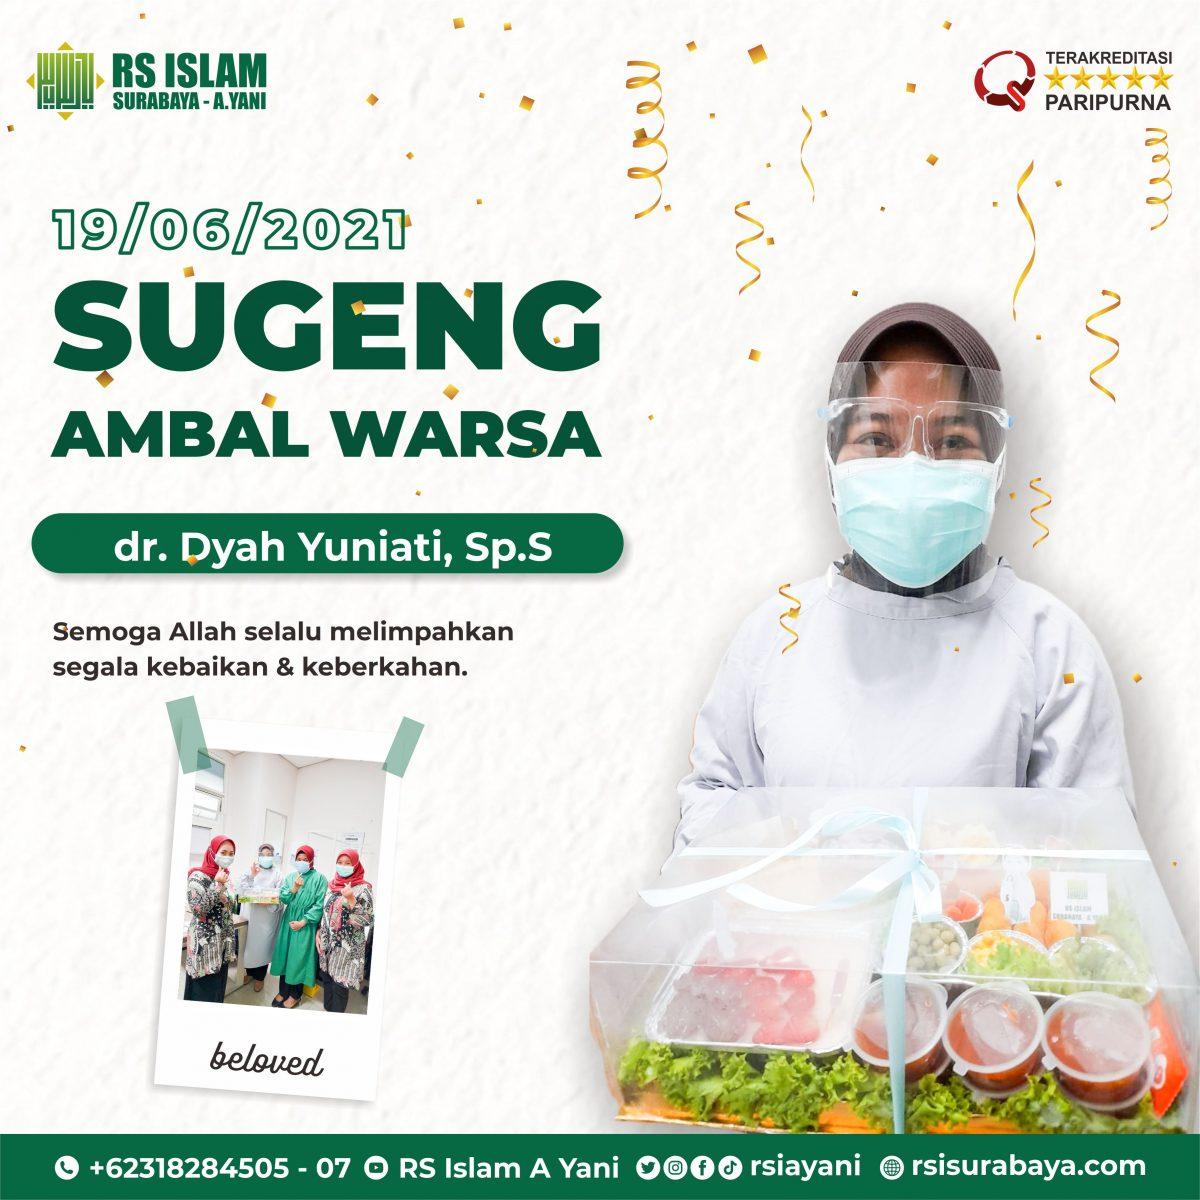 dr.-Dyah-Yuniati-Sp.S-19-Juni-2021-1200x1200.jpg